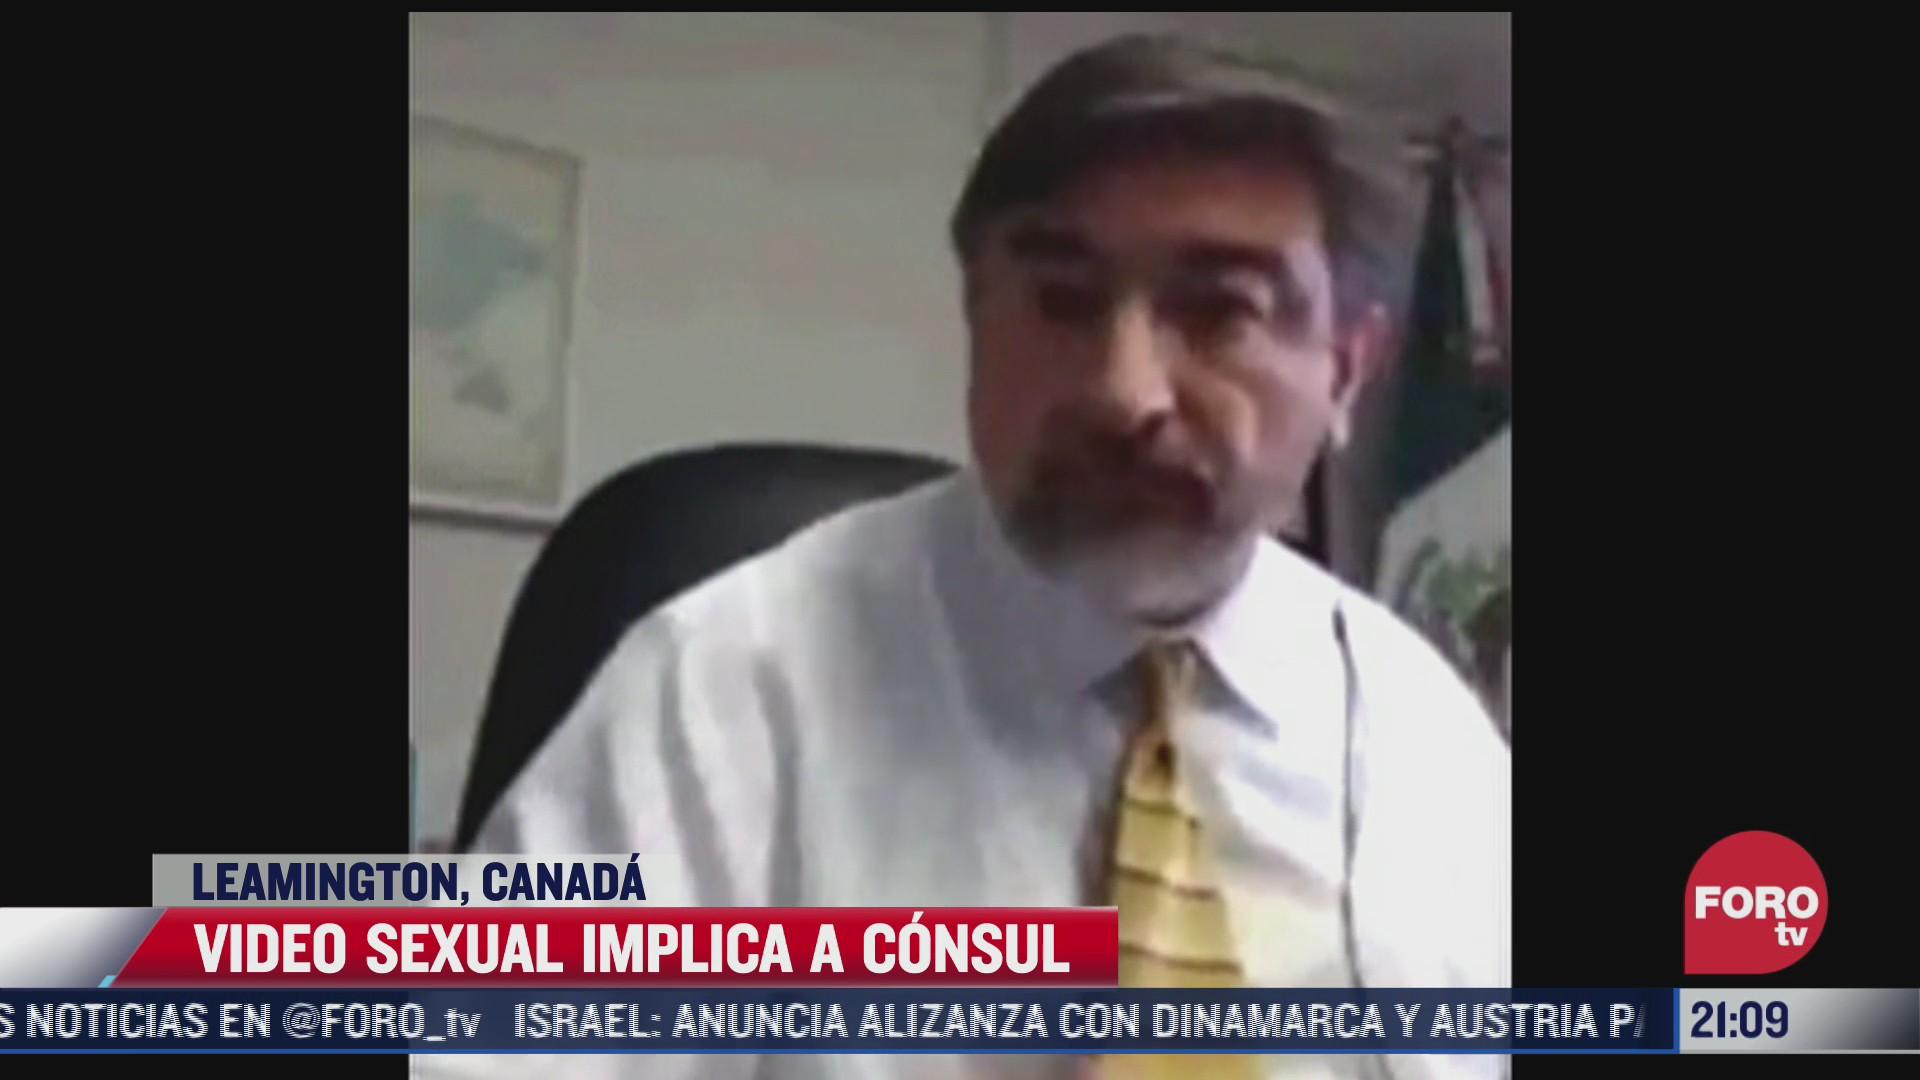 consul alberto bernal acero involucrado en video de contenido sexual